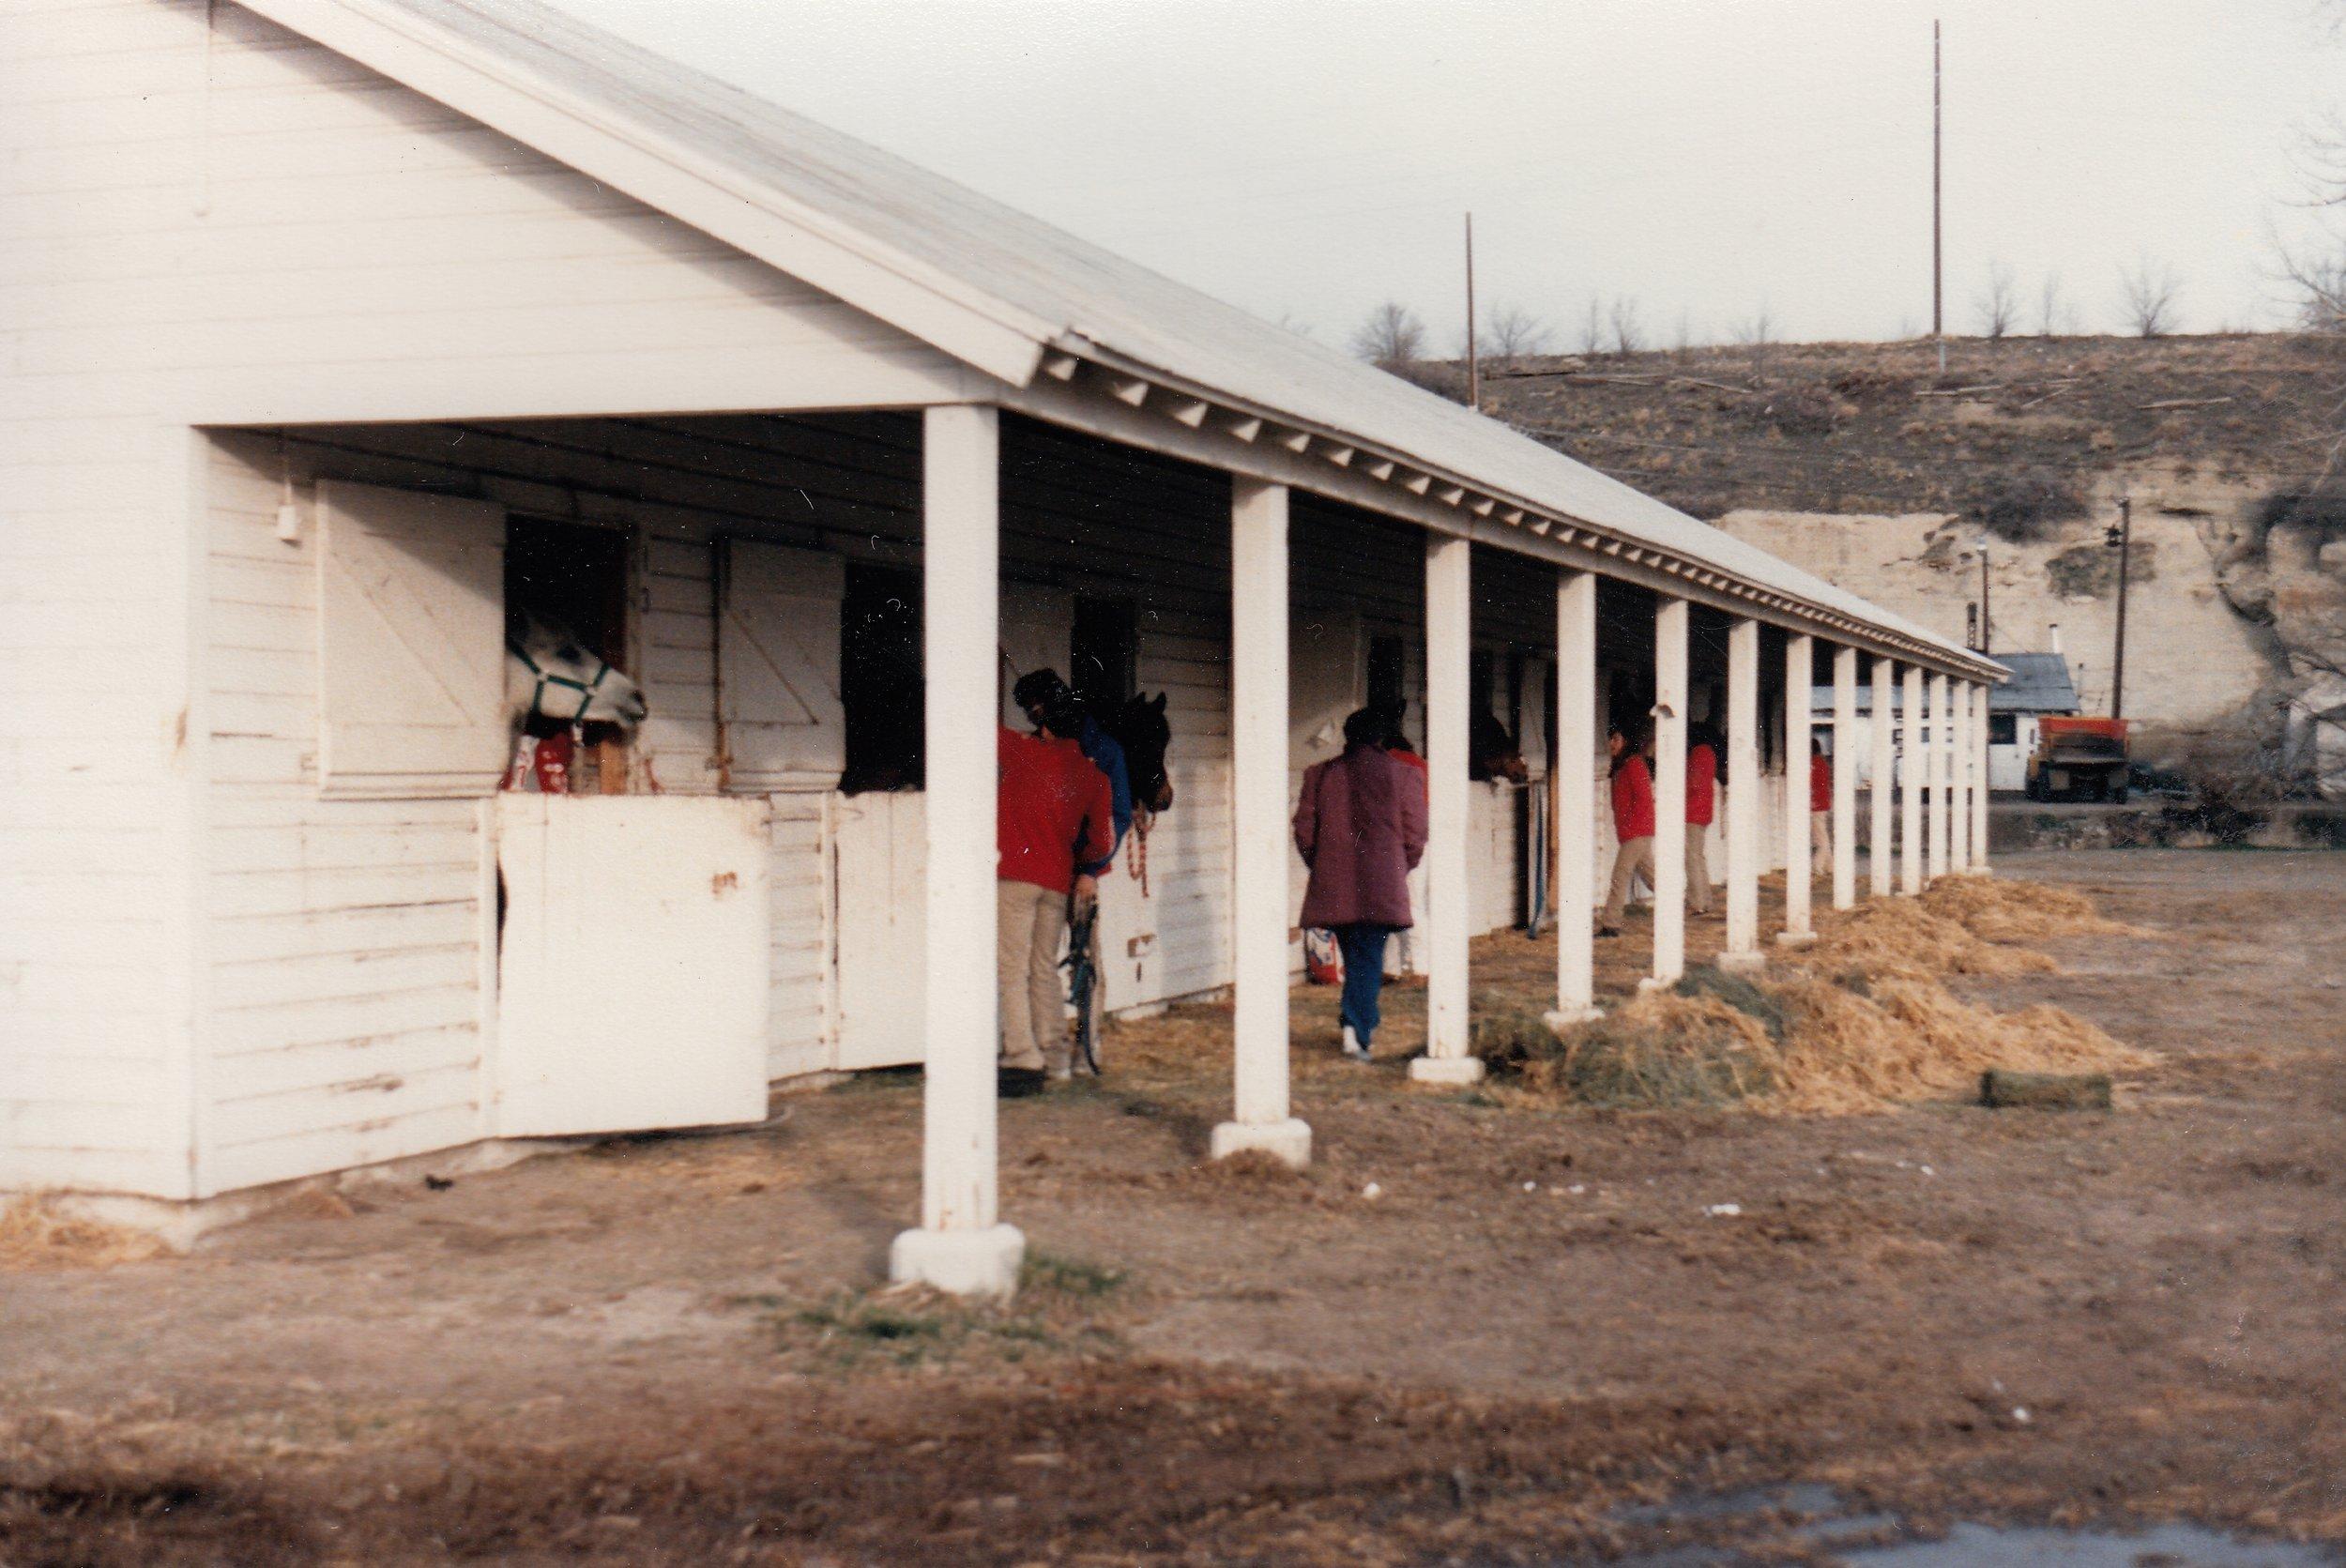 Westernaires horses stabled for the night in Billings, Montana, en route to Regina, Saskatchewan